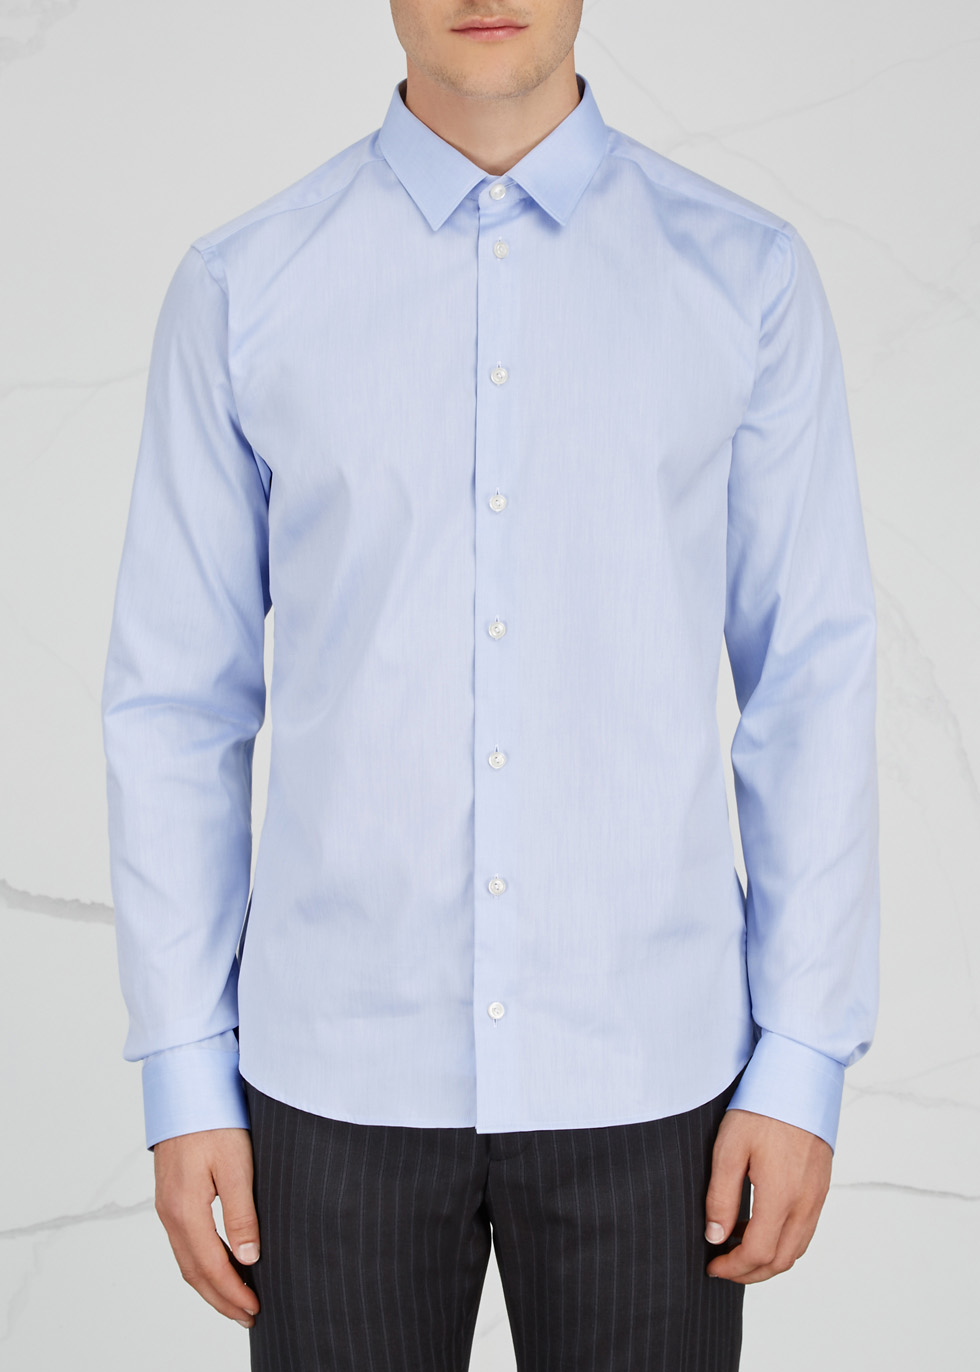 Blue super slim cotton twill shirt - Eton